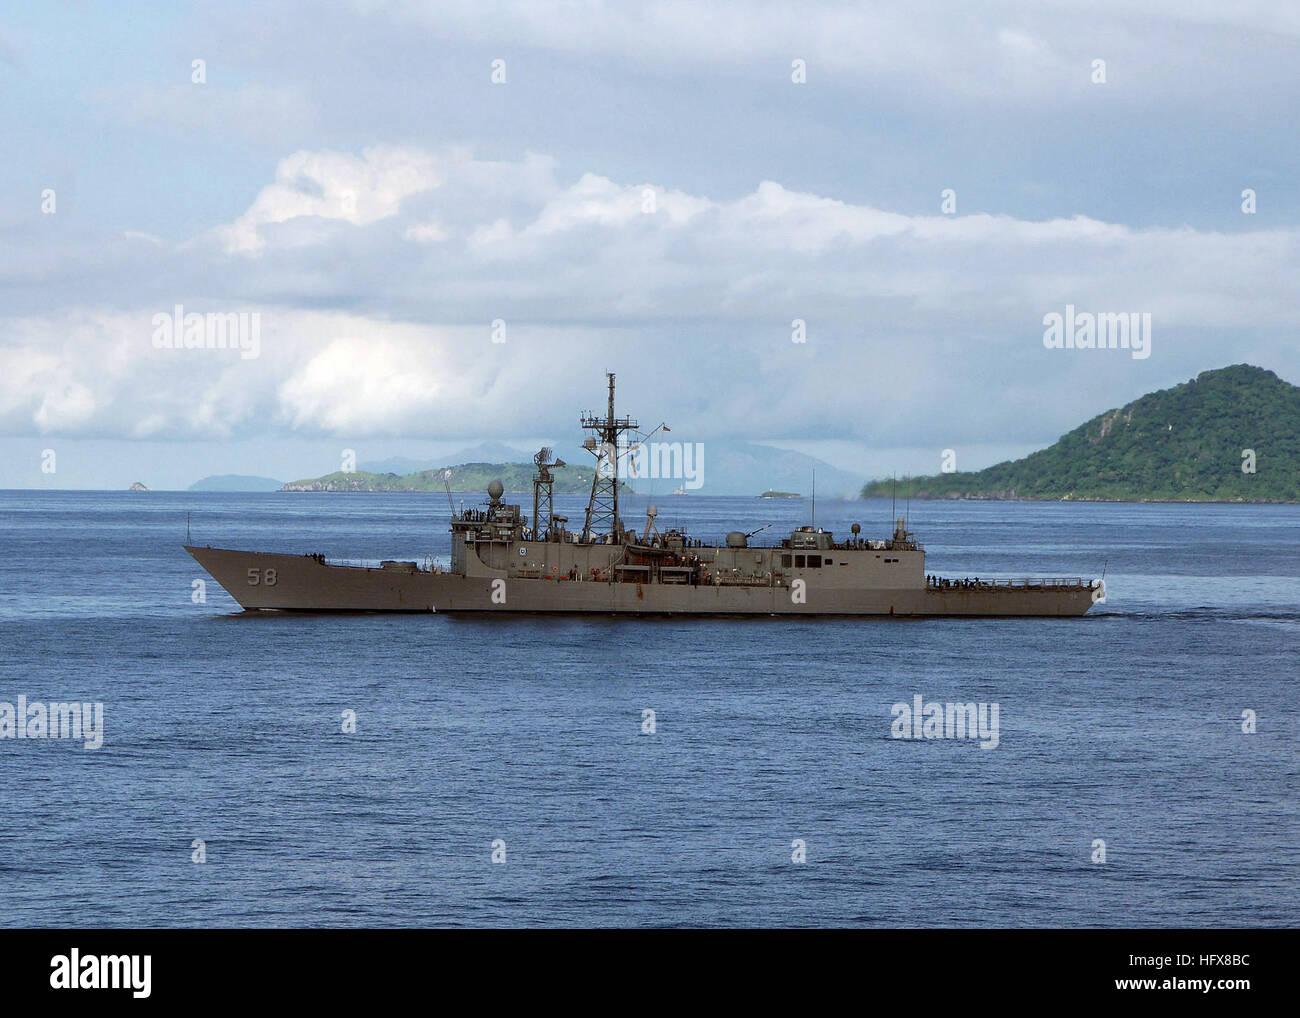 050716-N-4374S-001  Vasco Nunez de Balboa, Panama (July 16, 2005) - The guided missile frigate USS Samuel B. Roberts - Stock Image